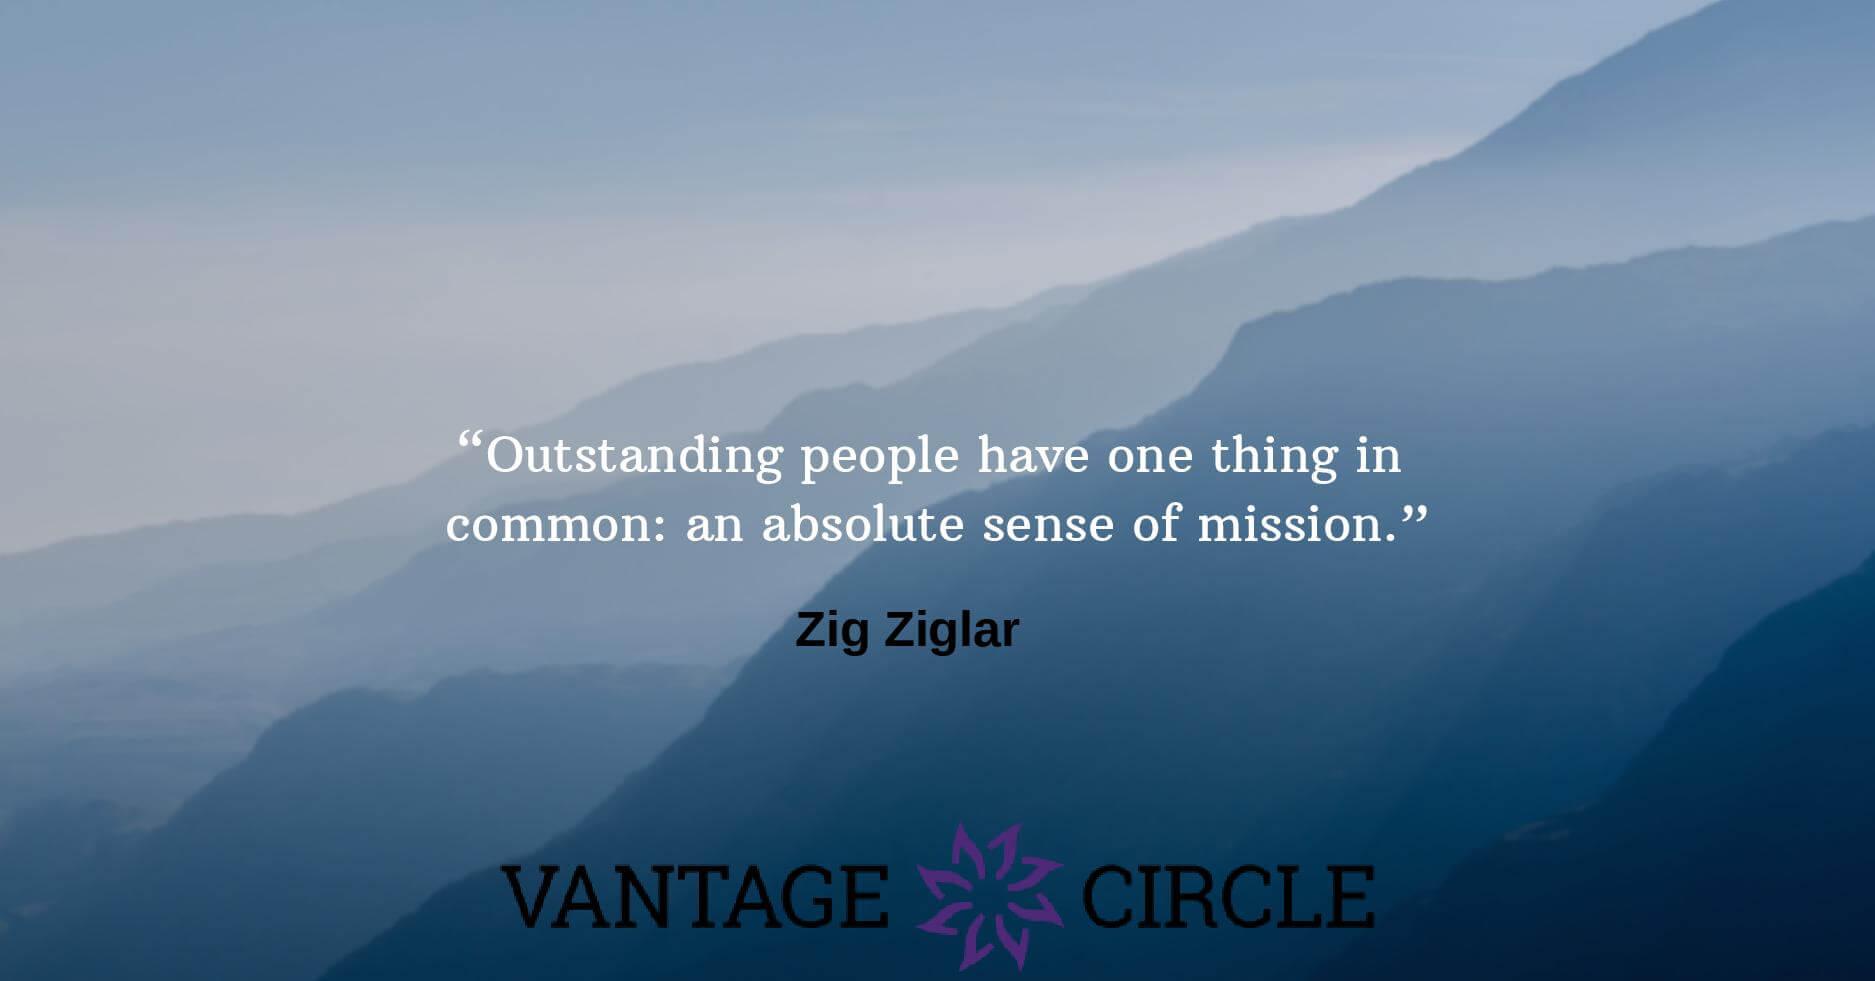 Employee-motivational-quotes-Zig-Ziglar